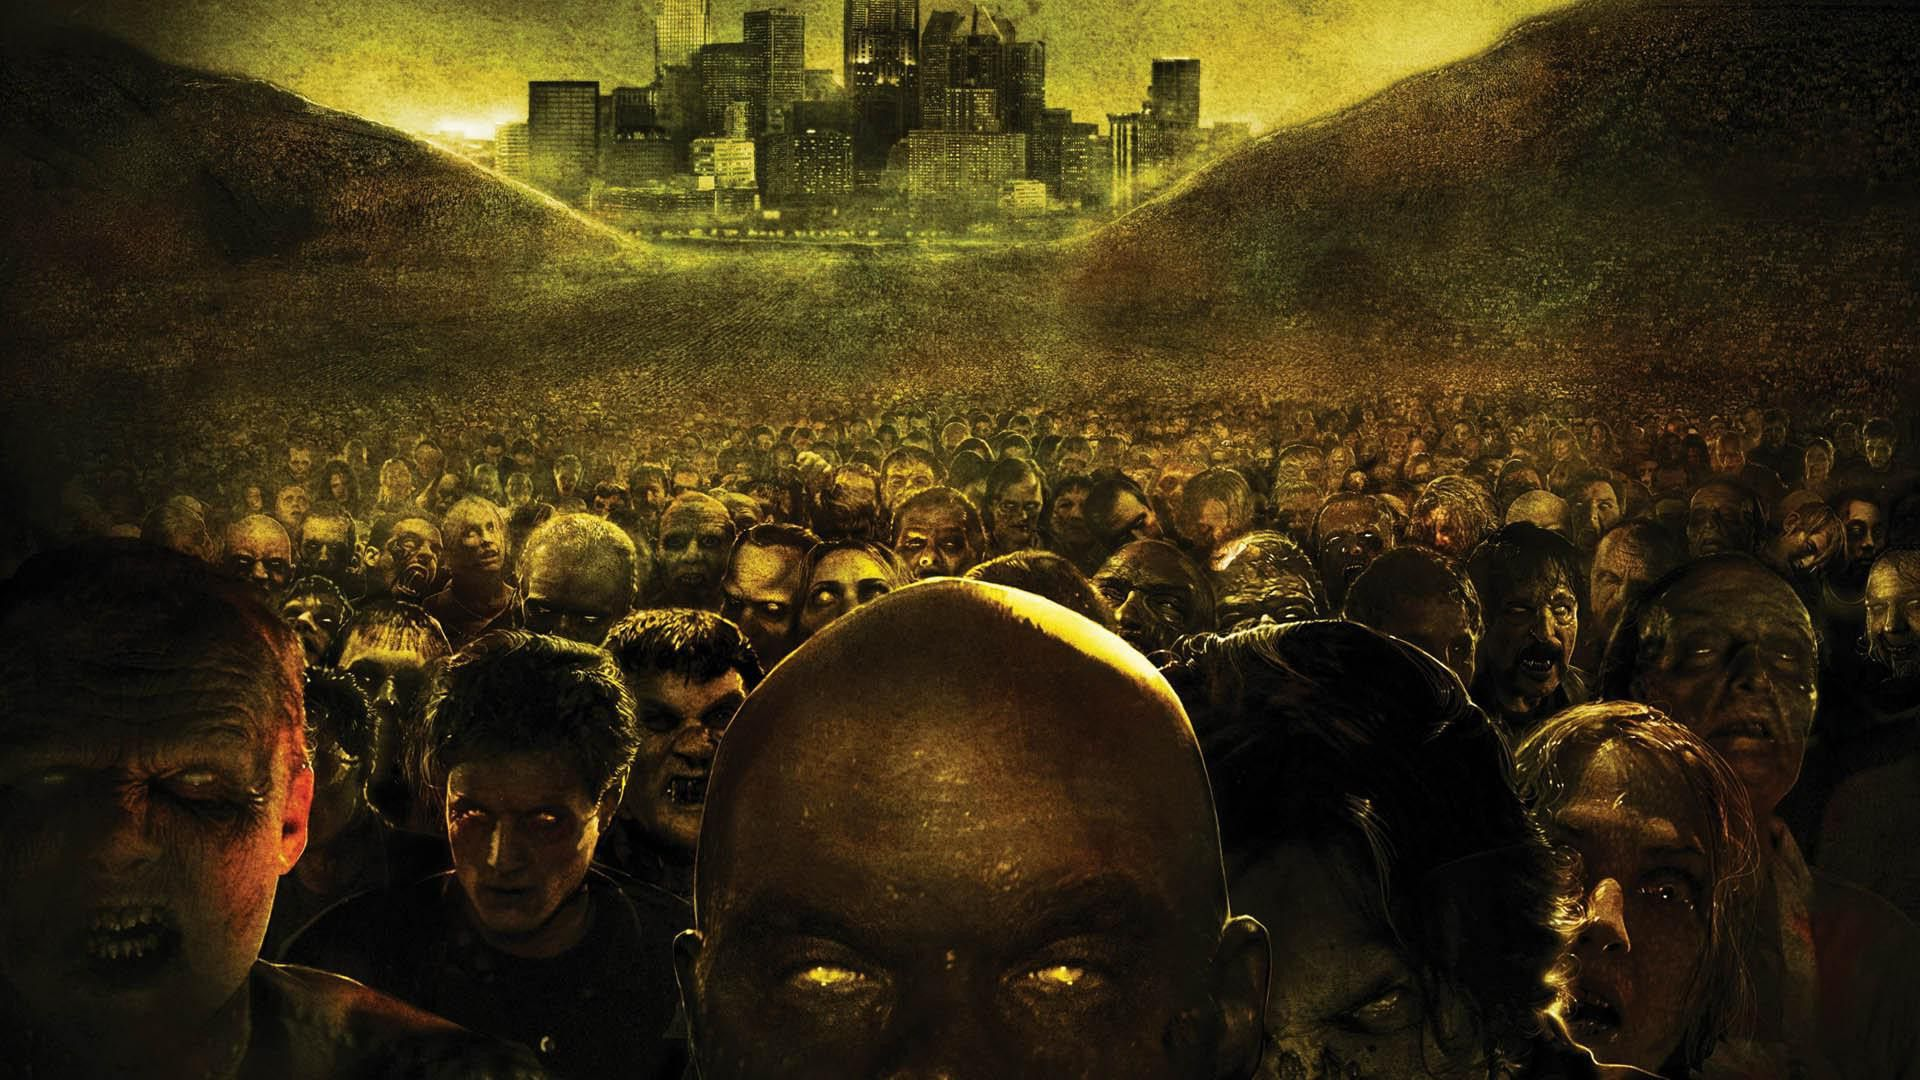 Fantasy Zombies Zombie Army Wallpaper Your Hd Wallpaper Id54016 Fondo De Pantalla Zombi Paseo Del Zombi Zombis